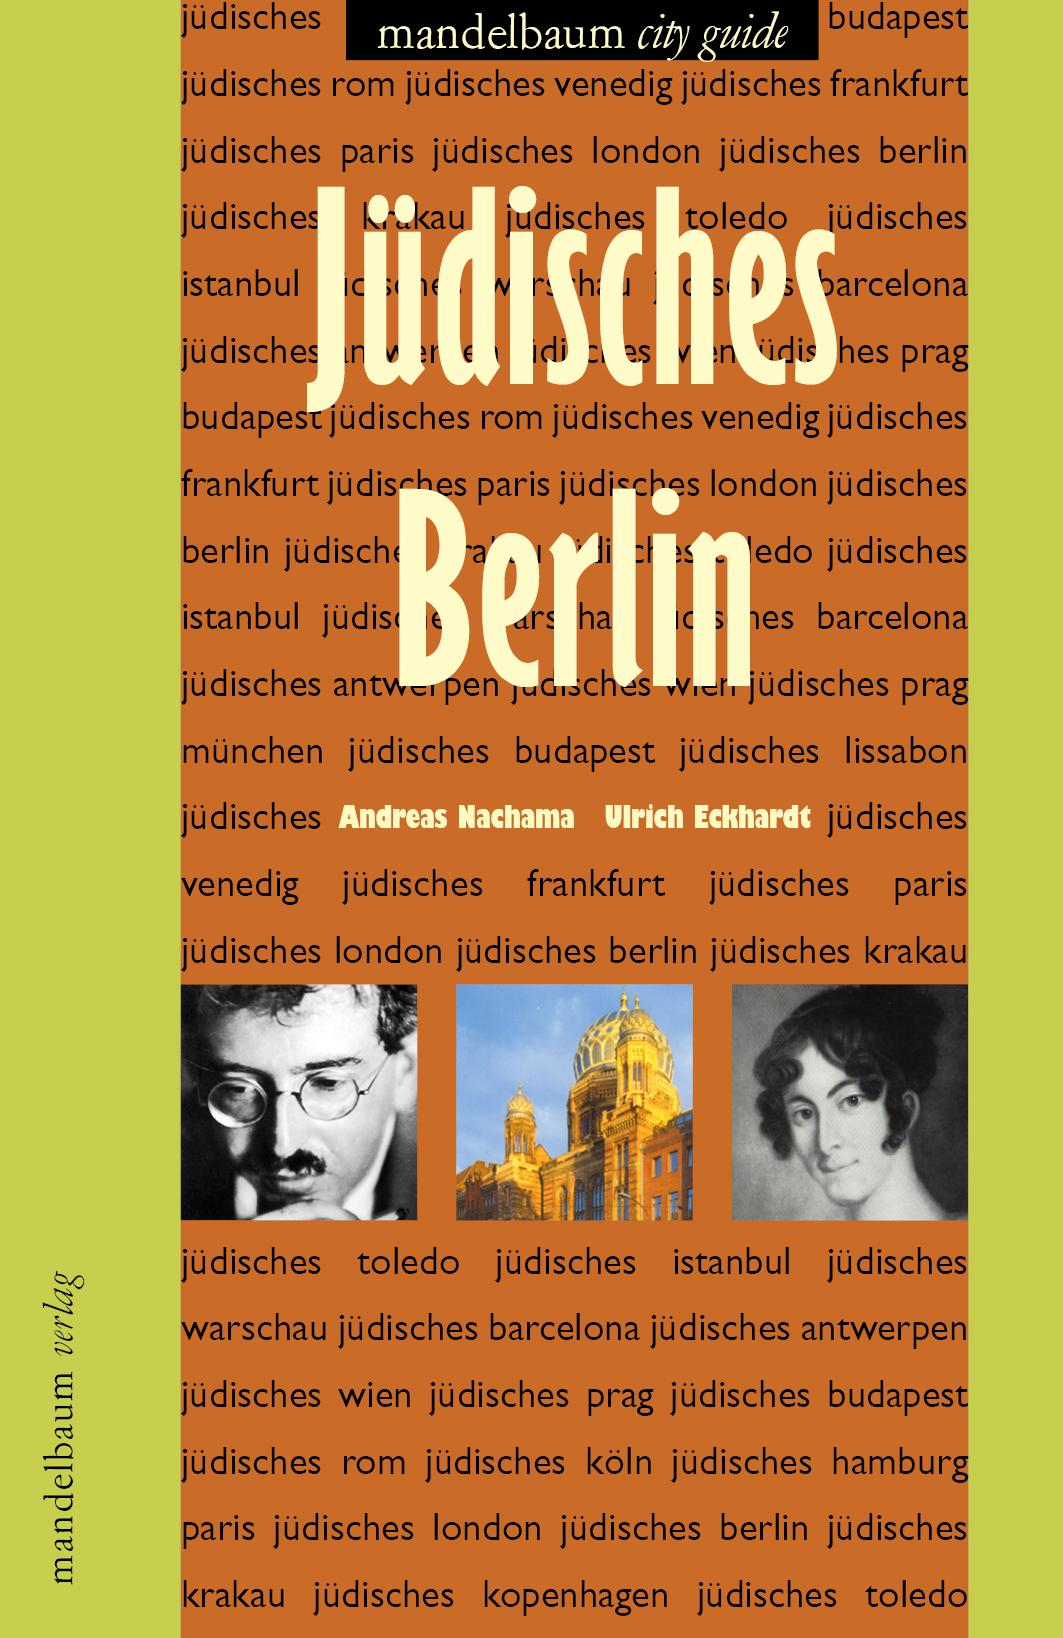 Juedisches-Berlin-Andreas-Nachama